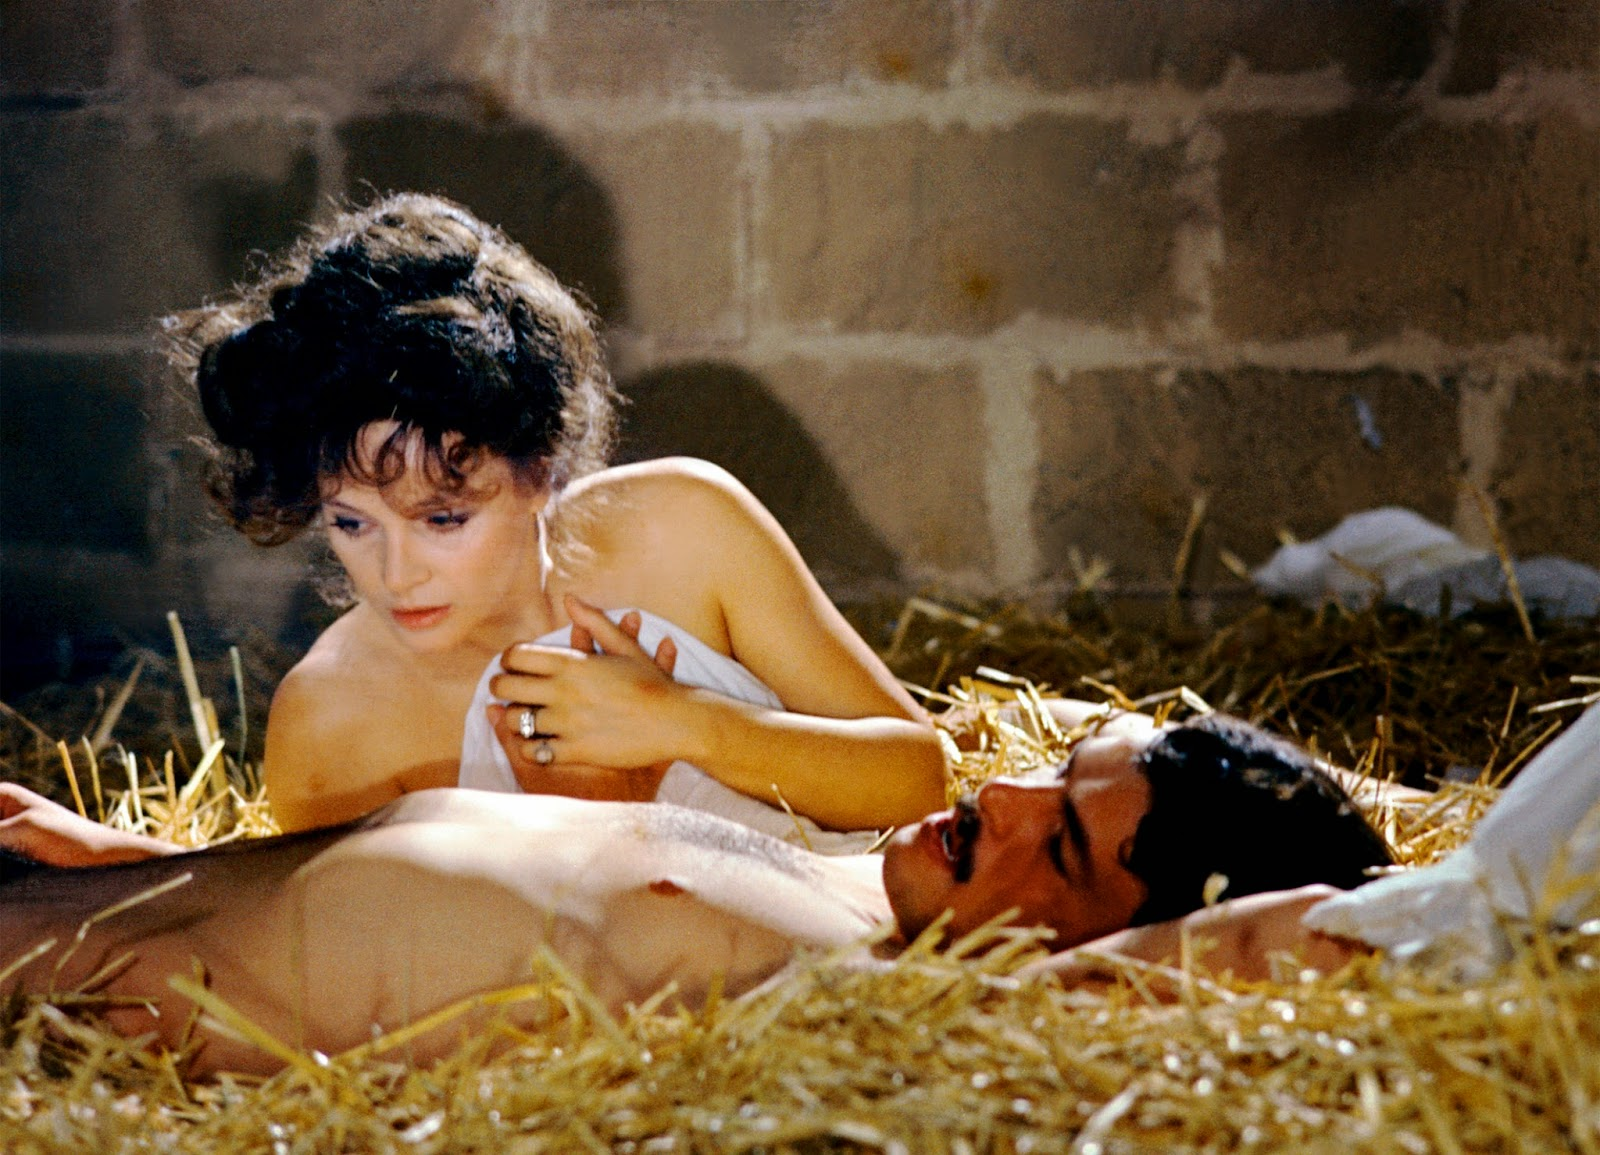 issledovanie-seksa-film-1974